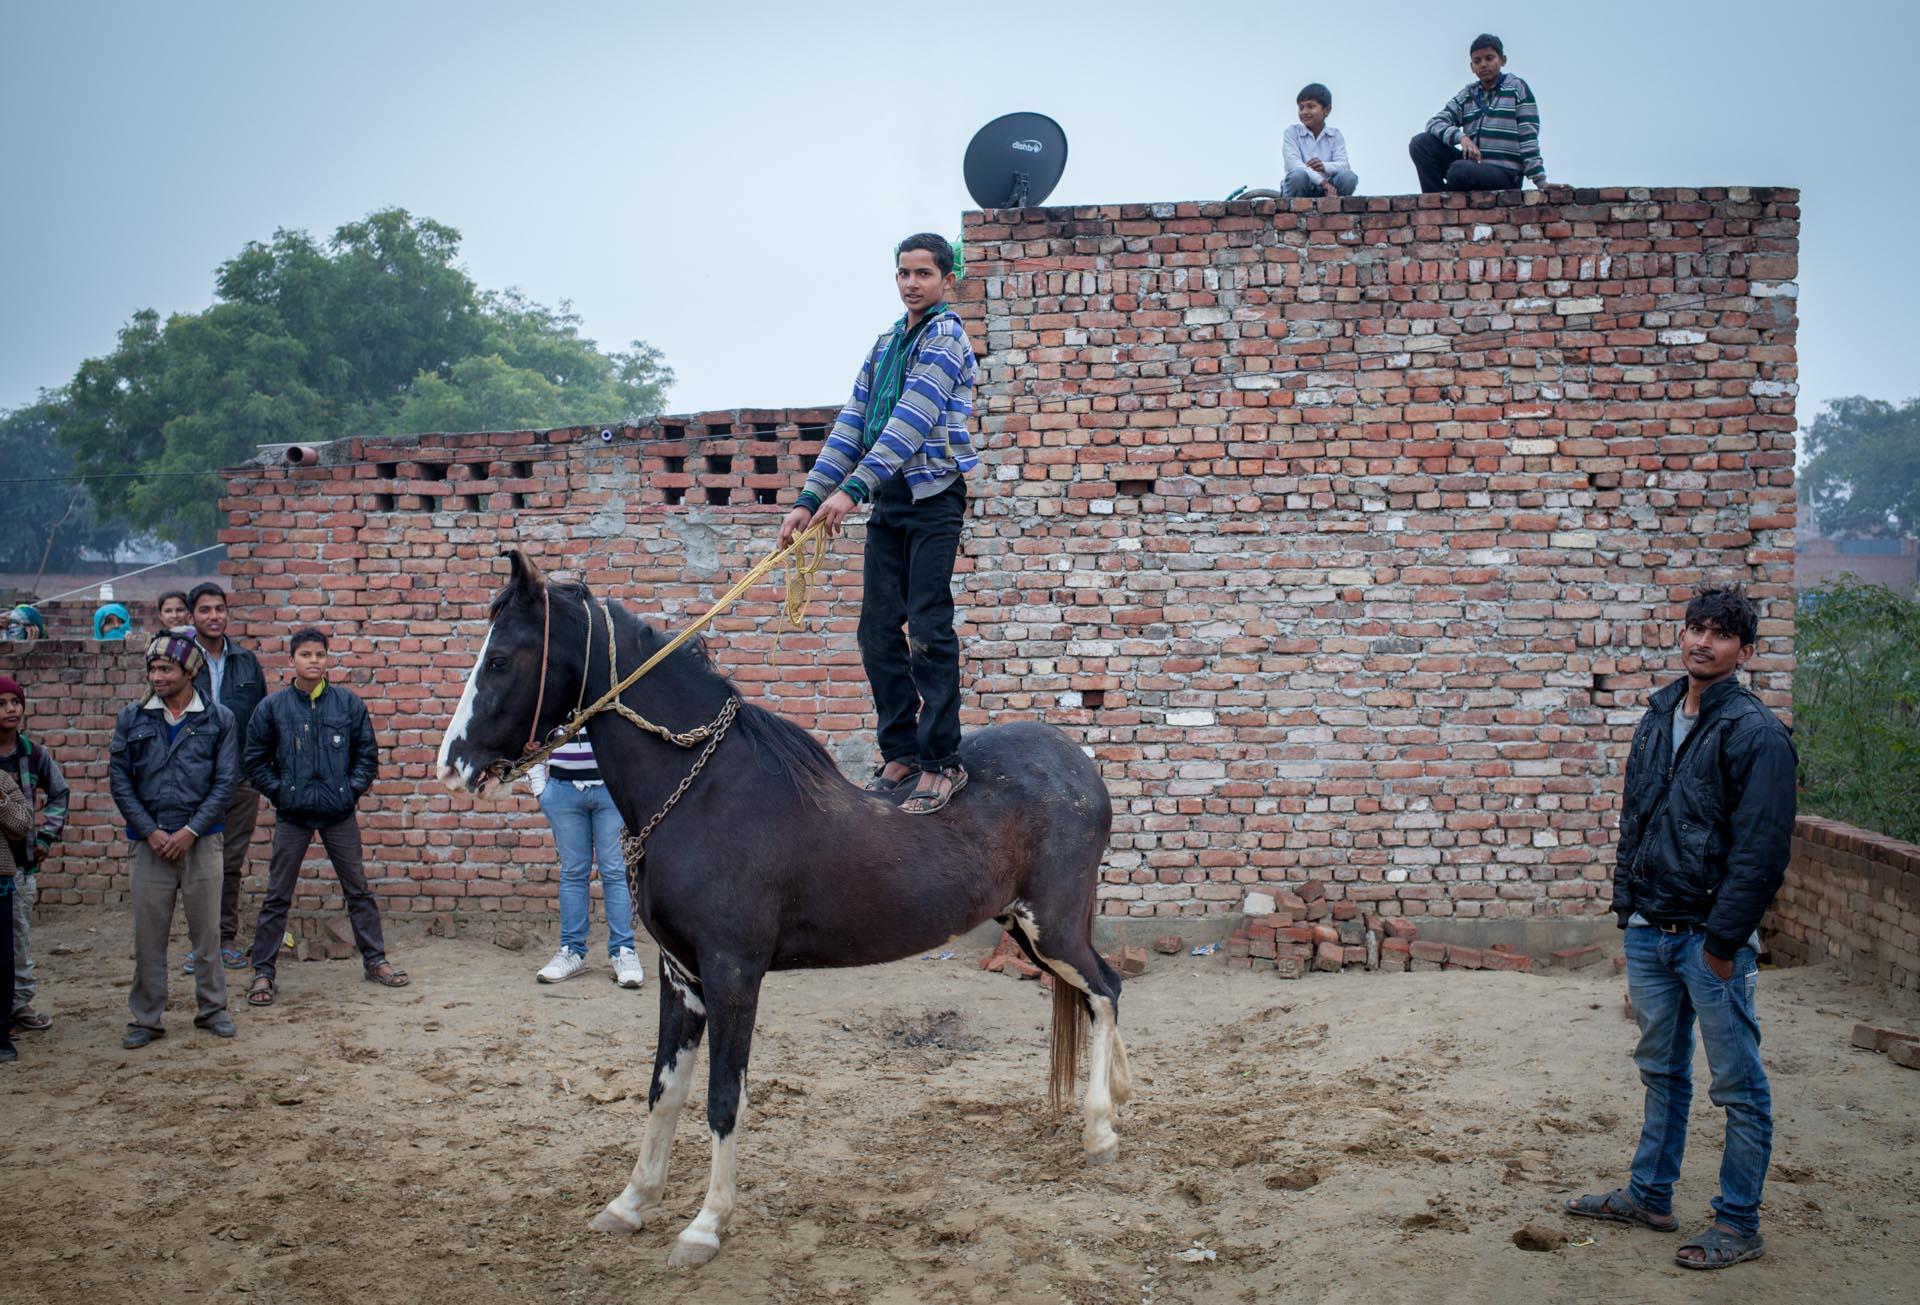 Mule and man. Donkey Sanctuary